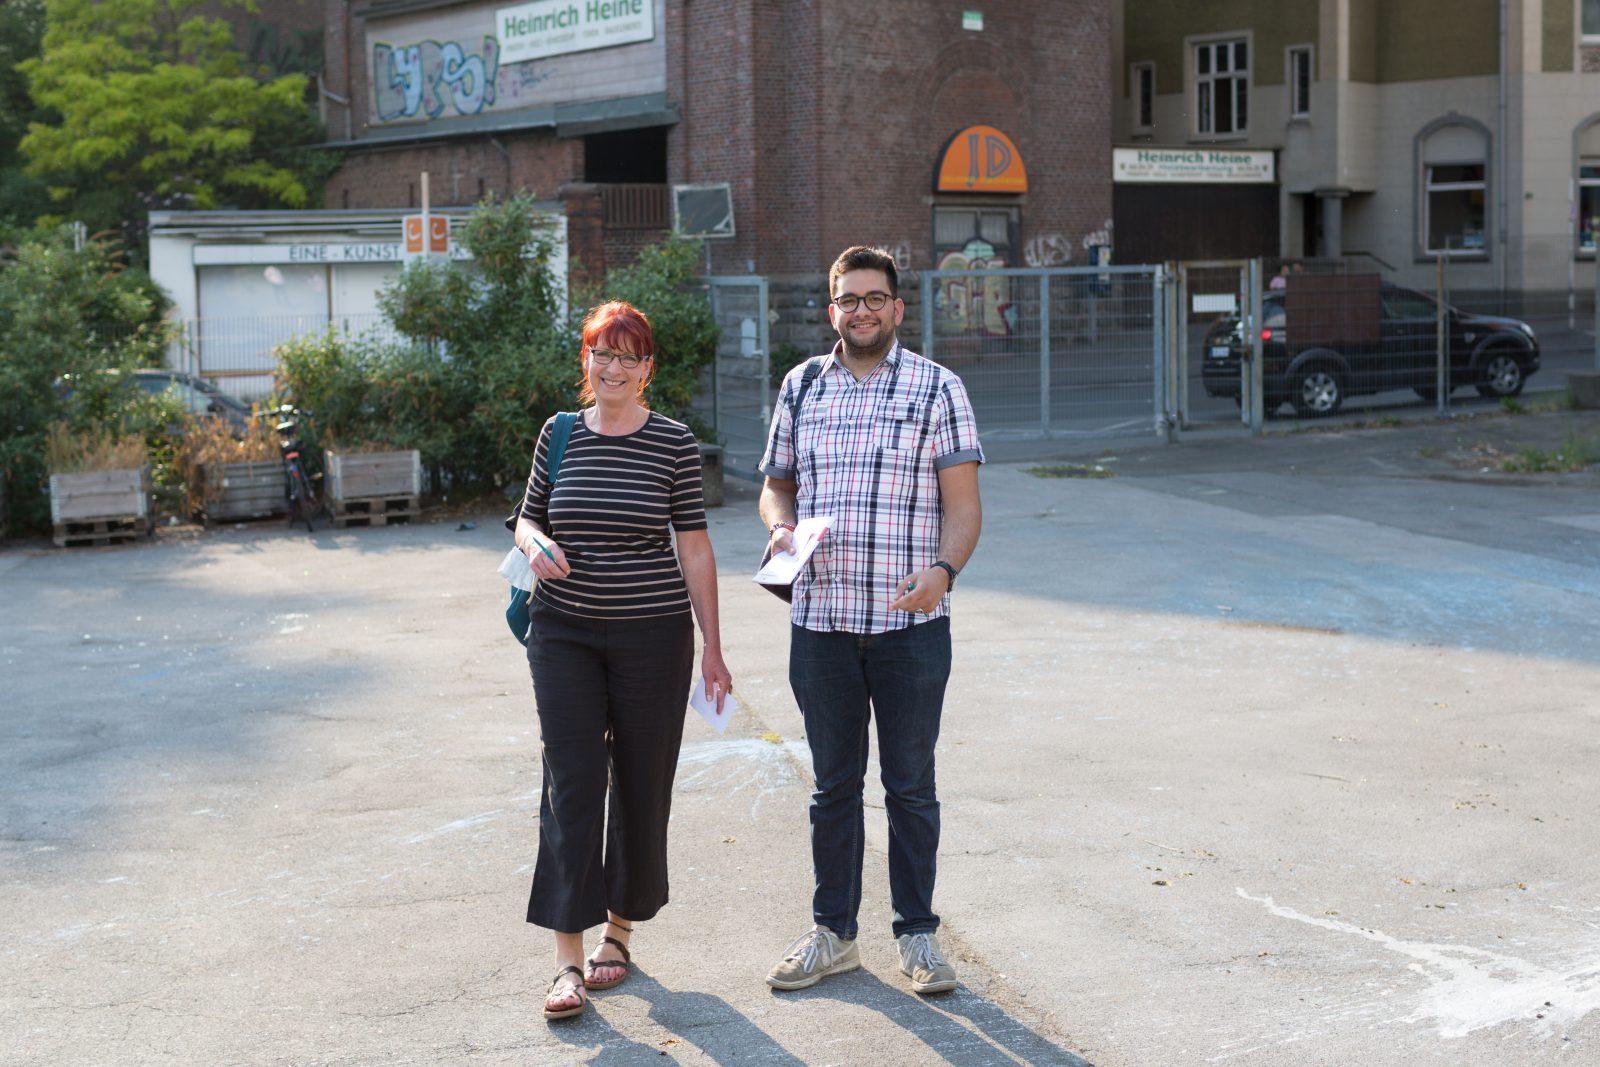 Foto: Suilian Richon, (C) Urbane Nachbarschaft BOB gGmbH